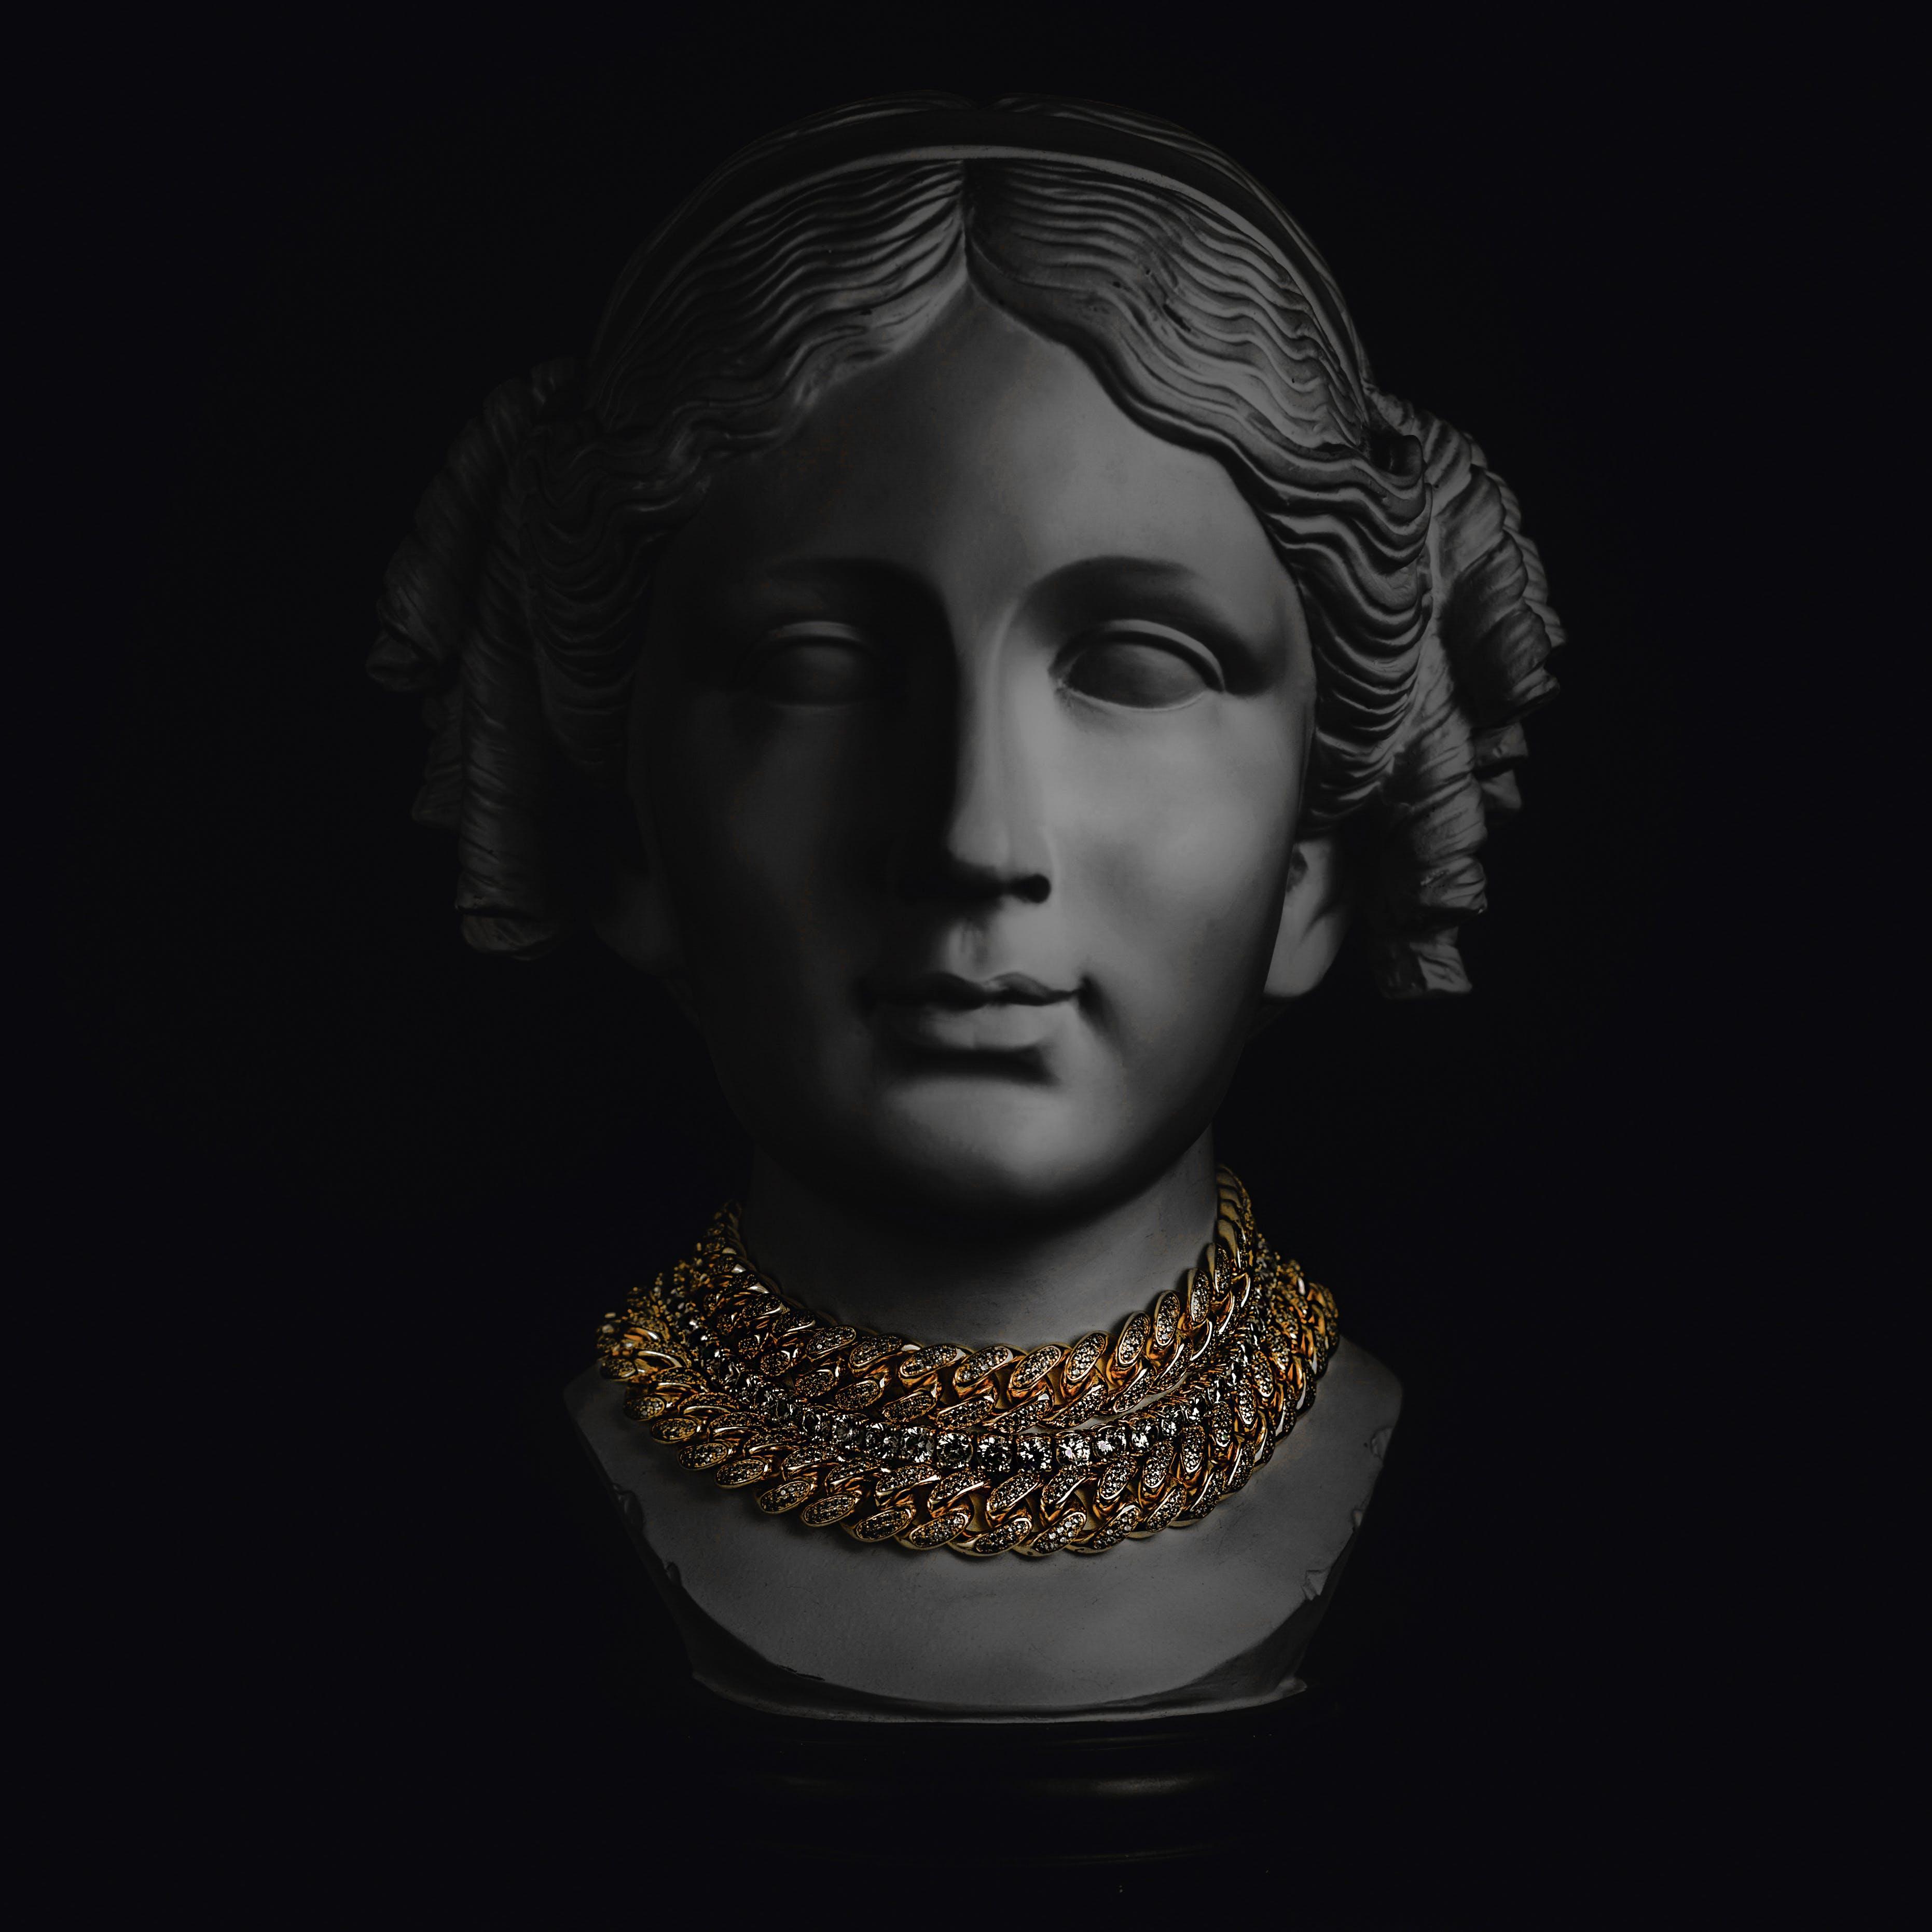 Gratis lagerfoto af close-up, diamant halskæde, diamanter, fotosession